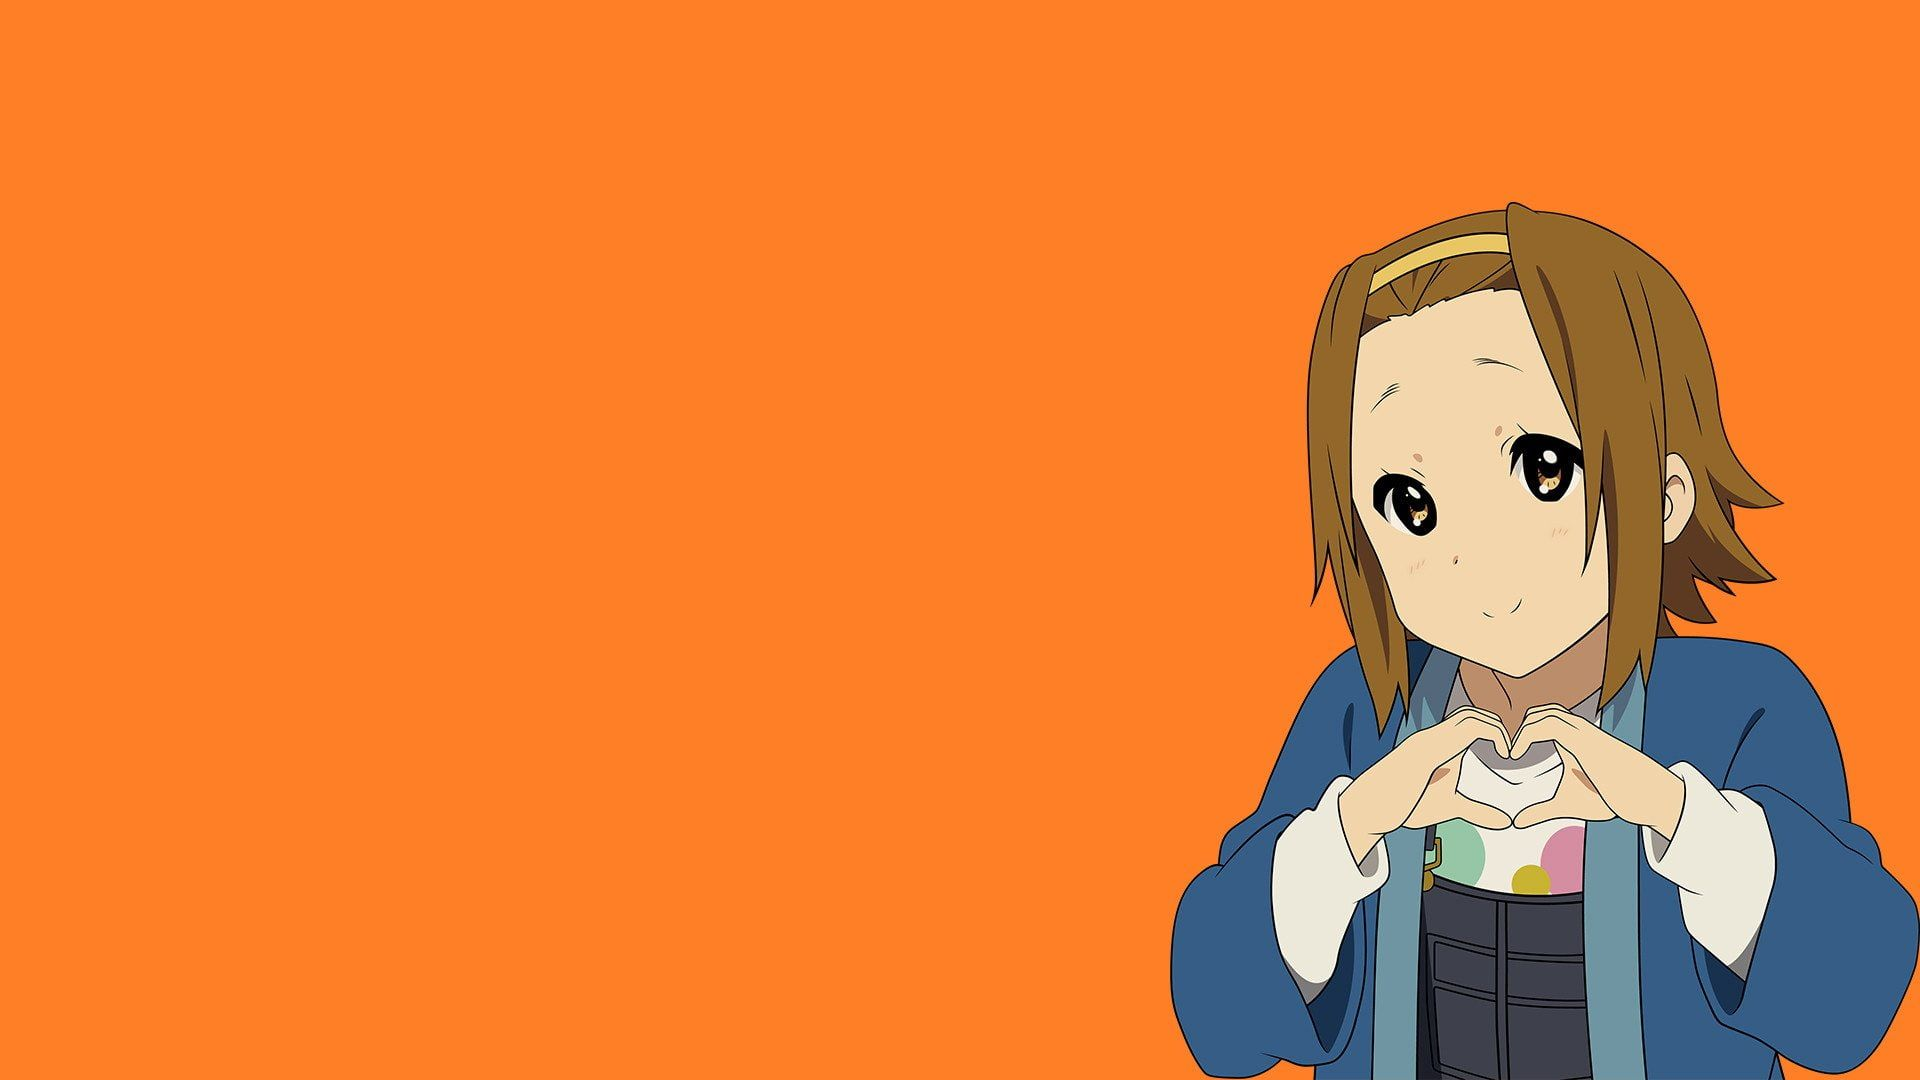 HD wallpaper: Anime, K-ON!, Ritsu Tainaka